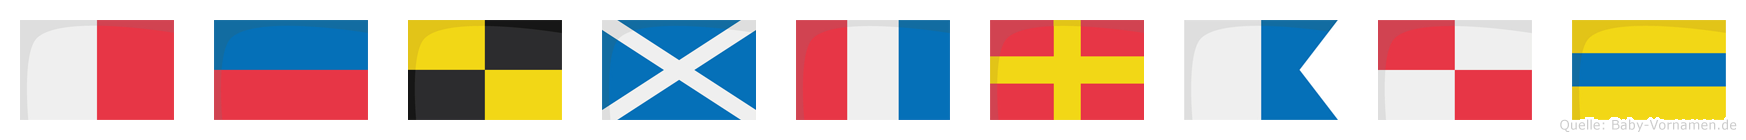 Helmtraud im Flaggenalphabet